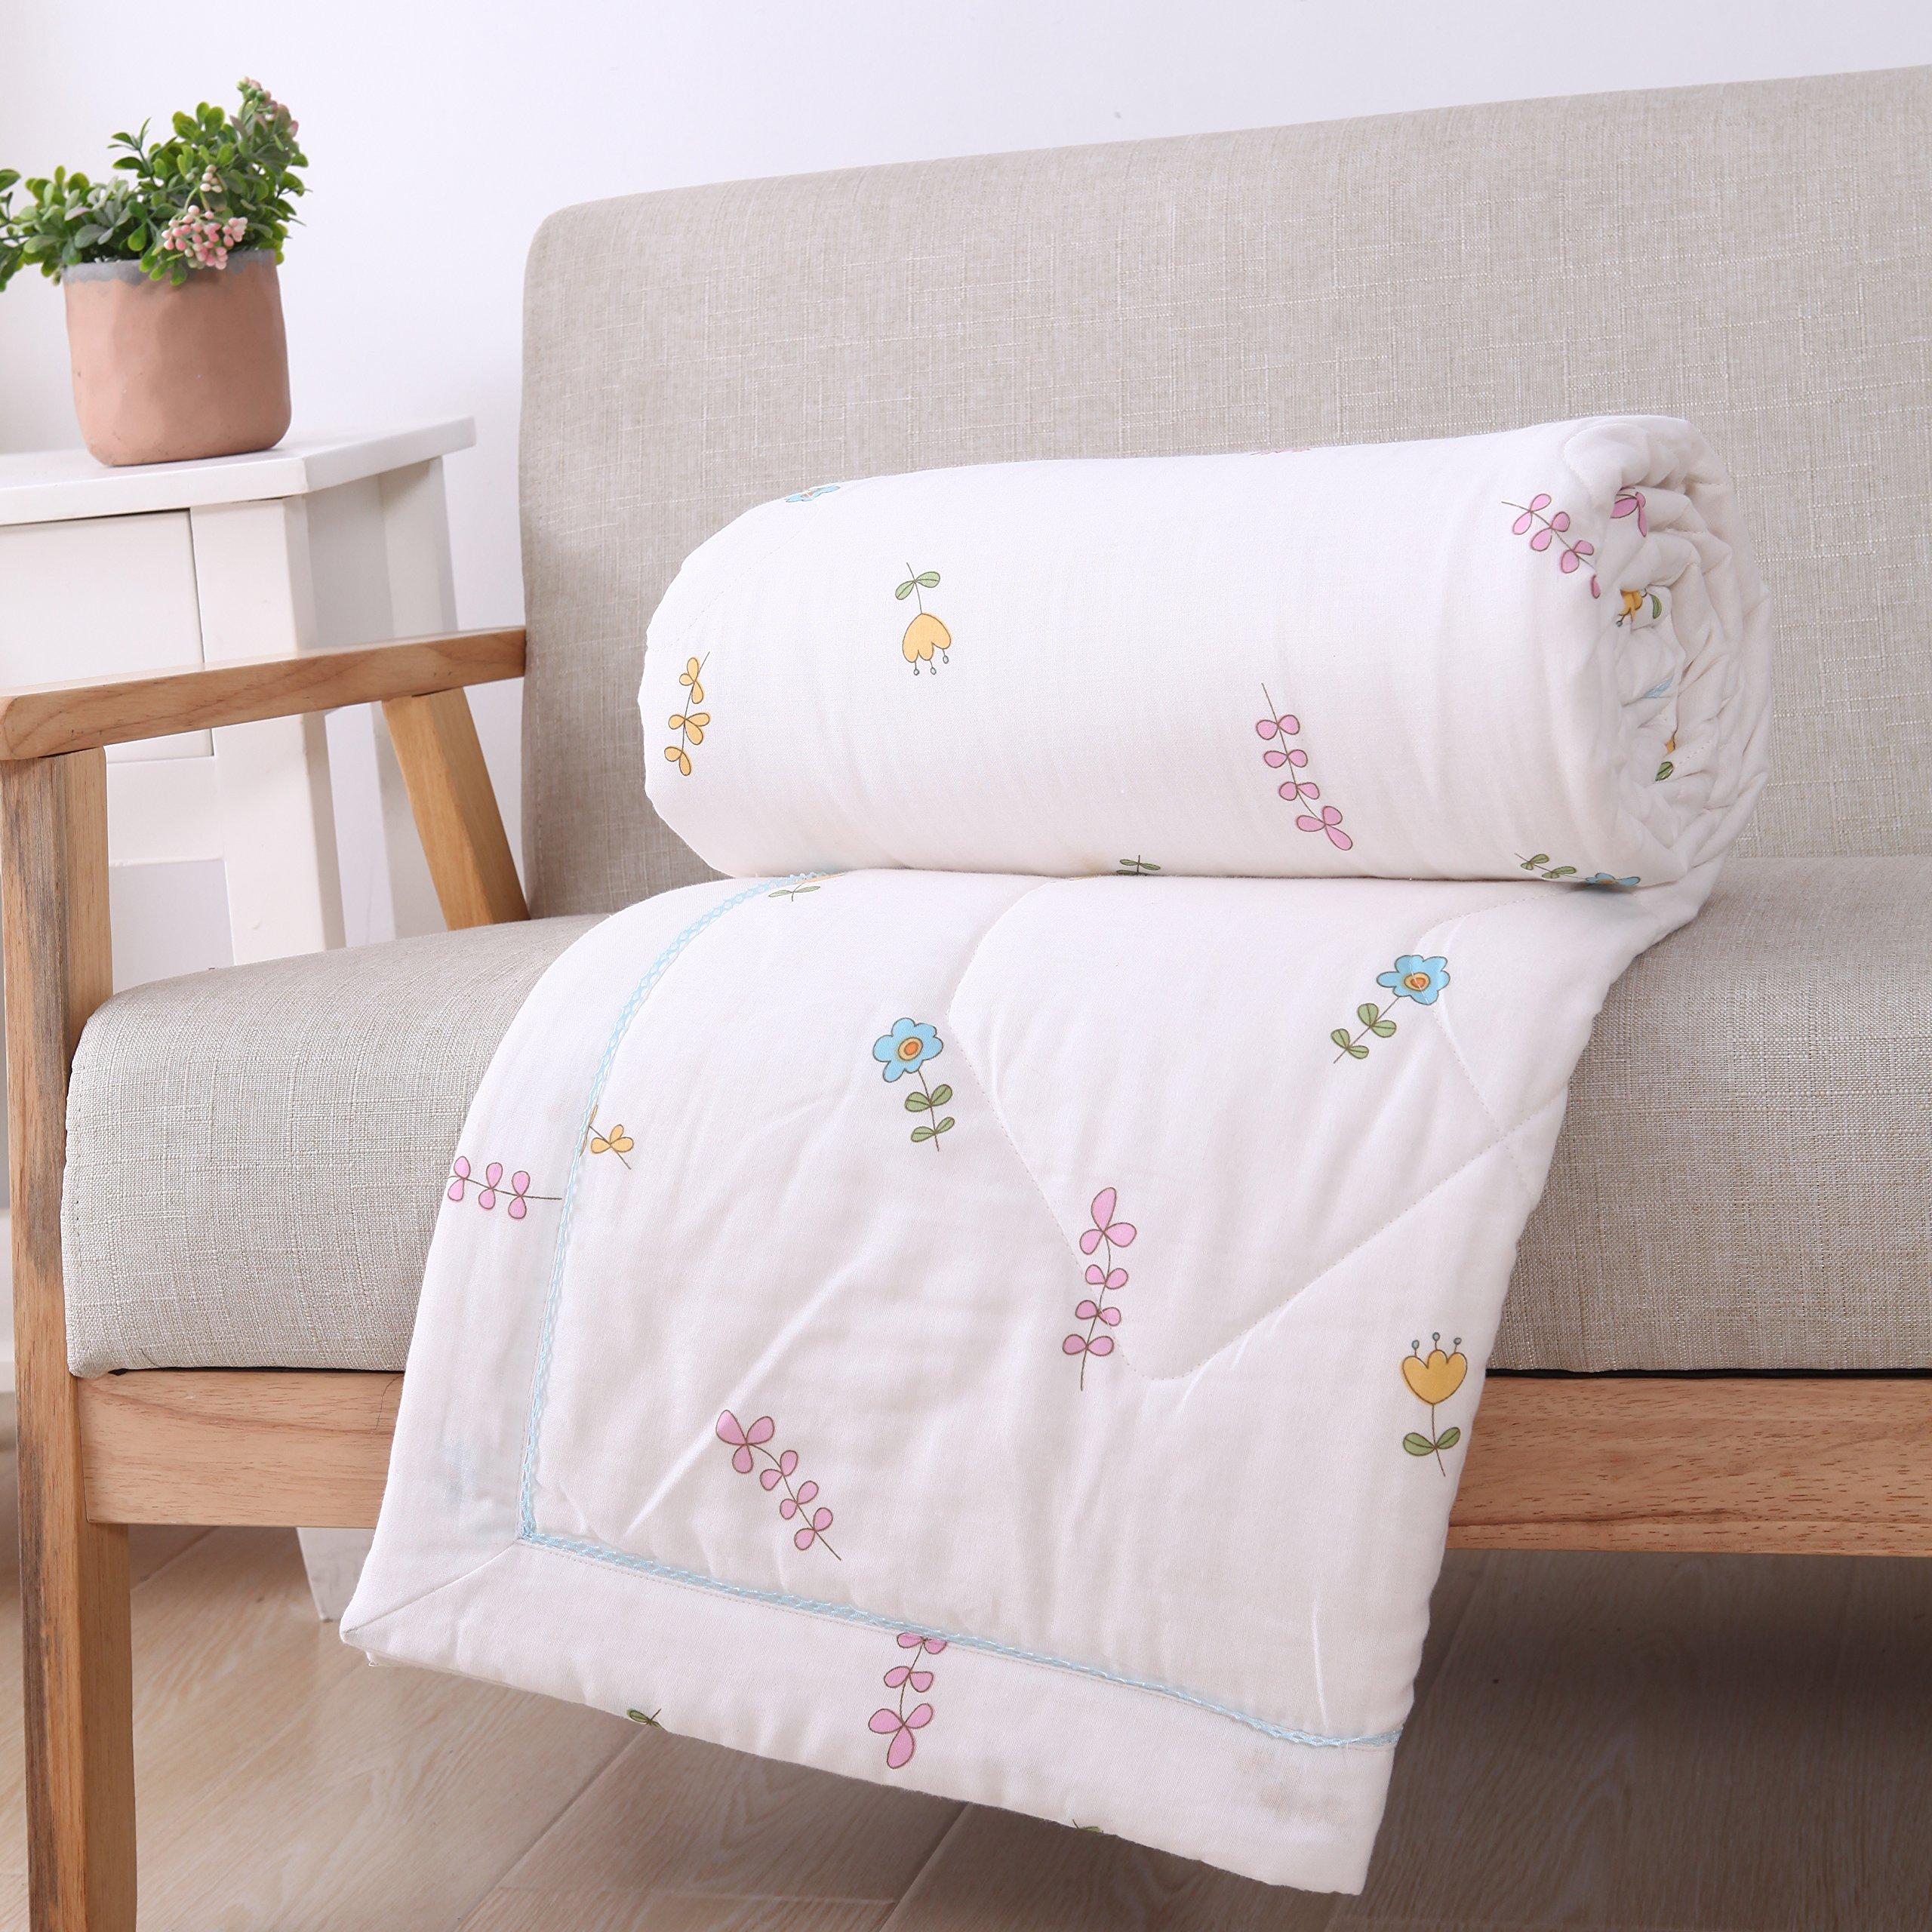 Scientific Sleep Boys & Girls Cartoon Flower Muslin Cotton Quilt Comforter Lightweight Bedding Coverlet Throw Blanket Crib/Twin/Full for Kid's Bedroom Decoration Gift (Twin 59'' X 78'', flower)